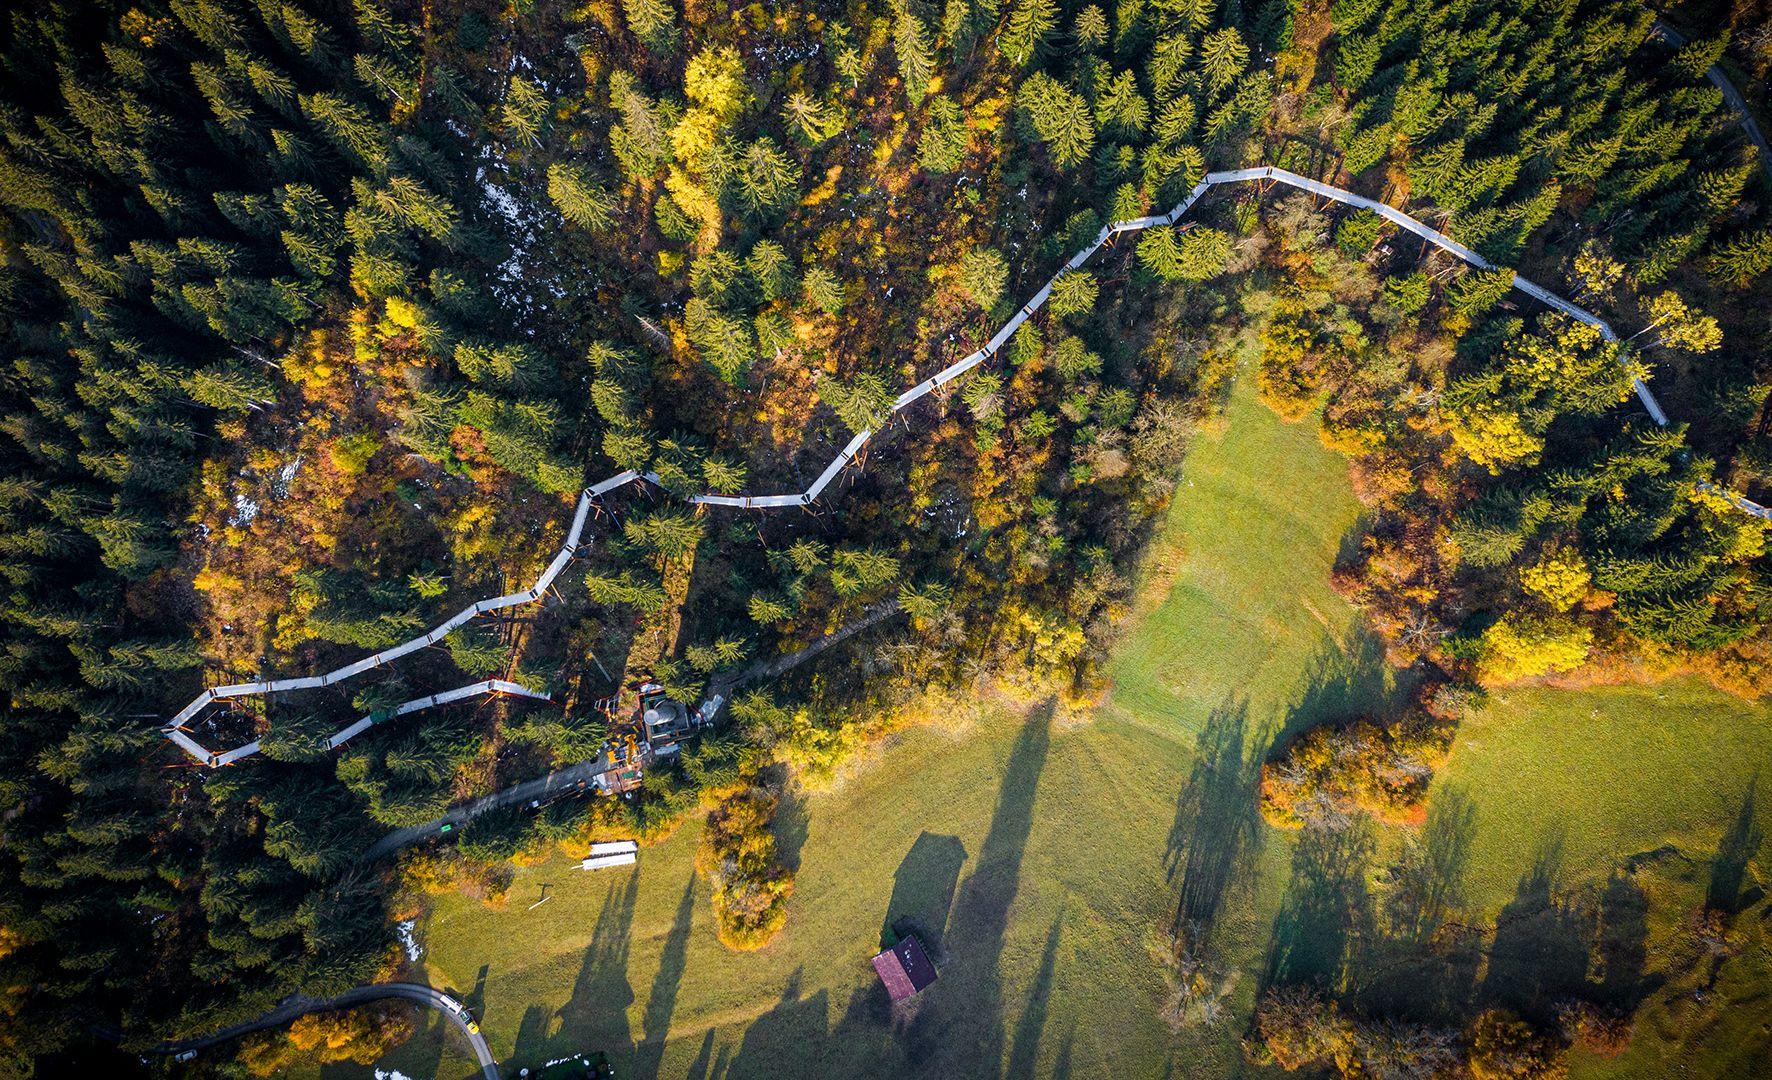 Schweiz: Längster Baumwipfelpfad der Welt eröffnet